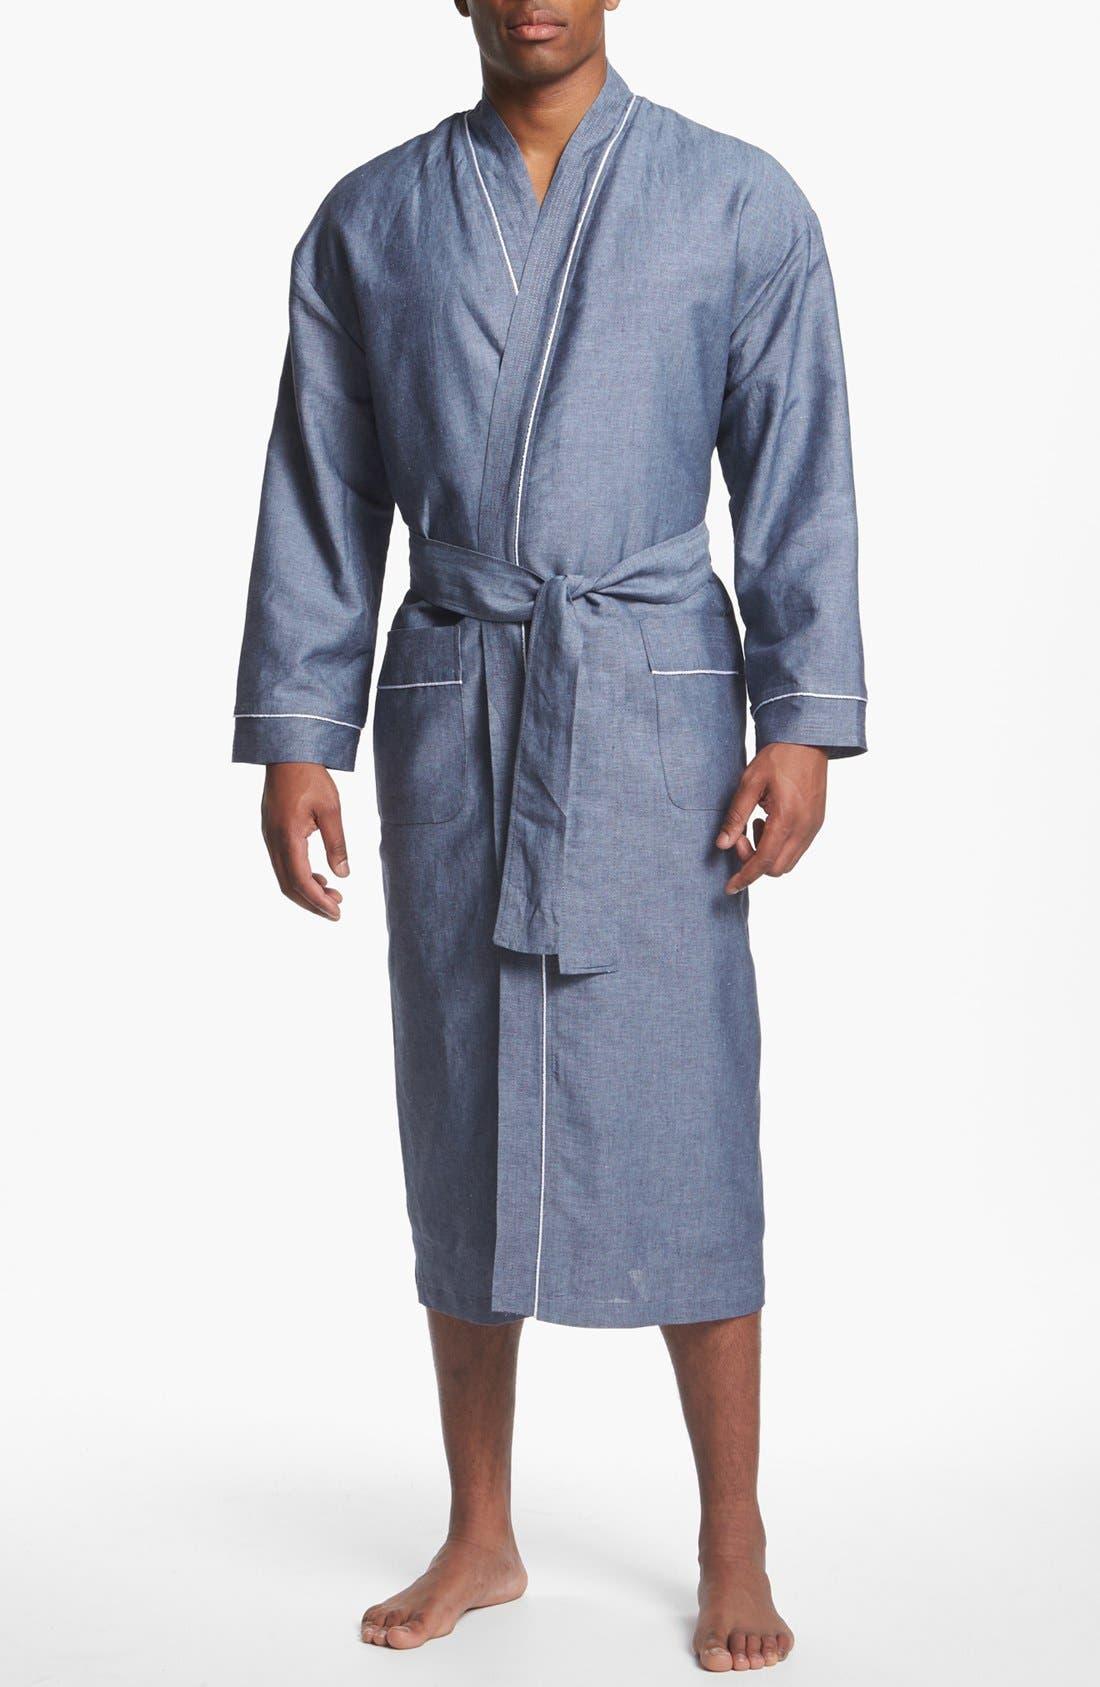 Main Image - Majestic International 'Capriz' Linen Blend Robe